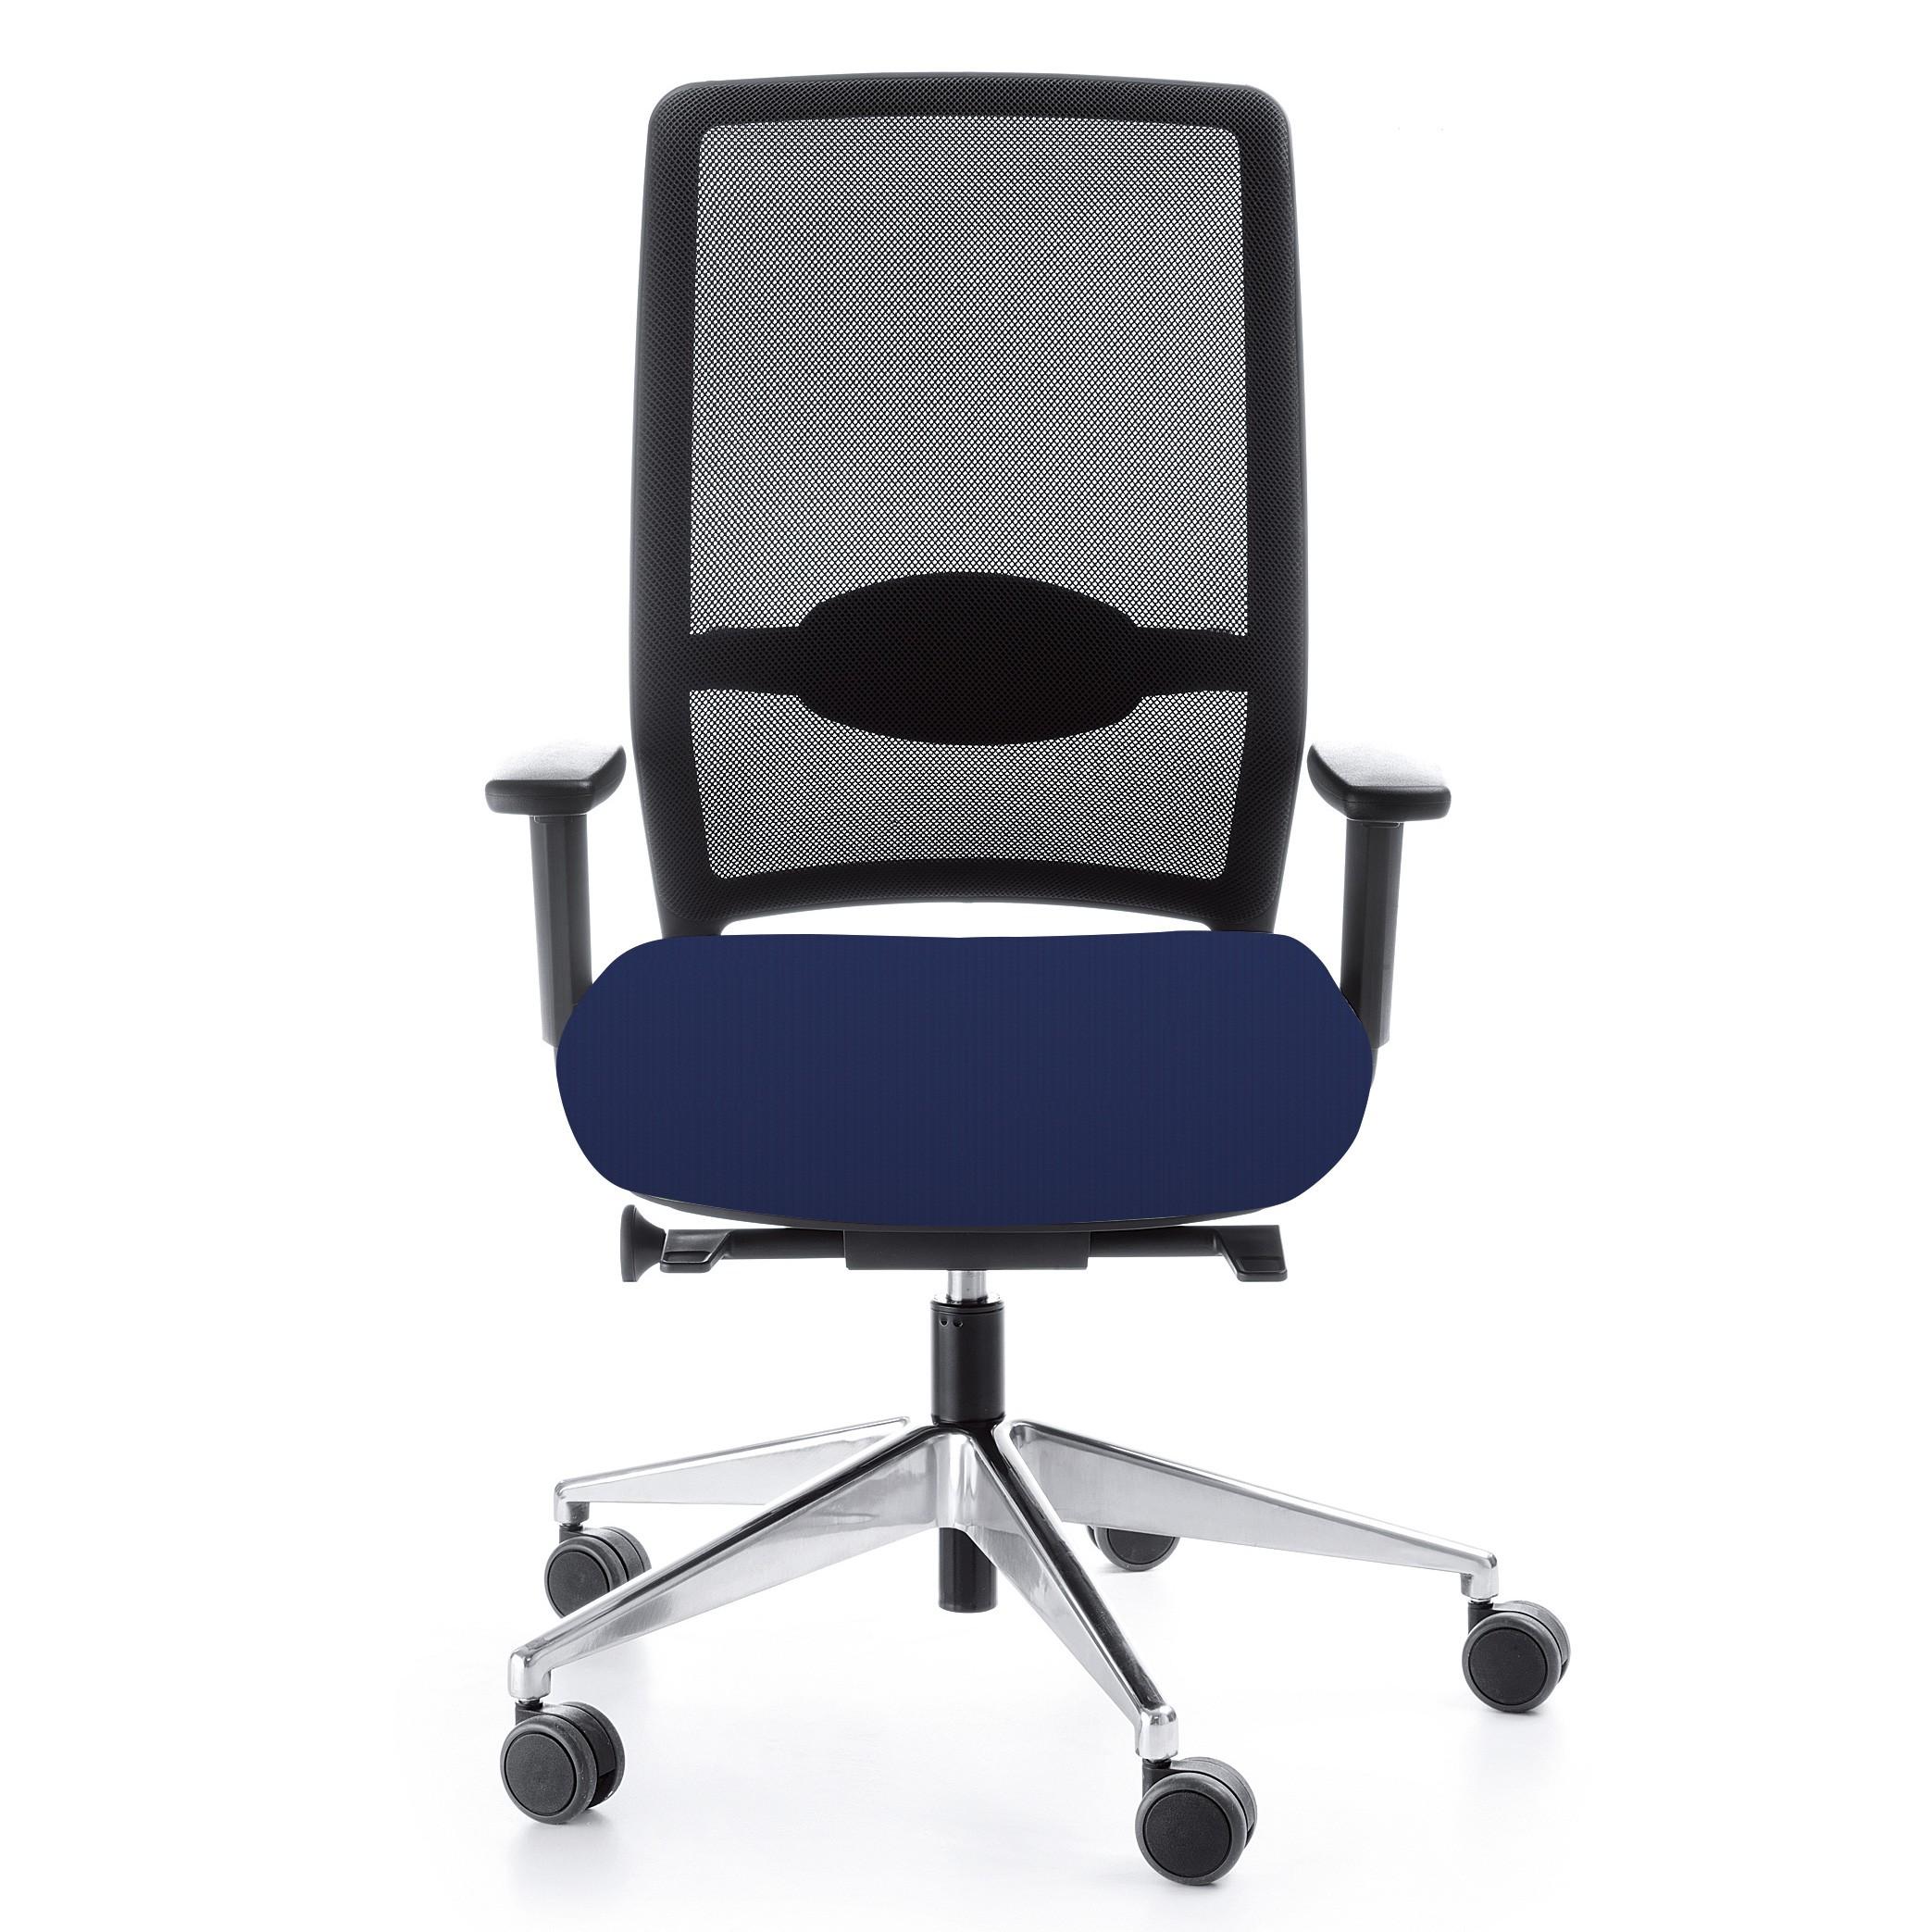 profim Drehstuhl Veris 10 Net - Farbe und Ausstattung wählbar - Büro Stuhl